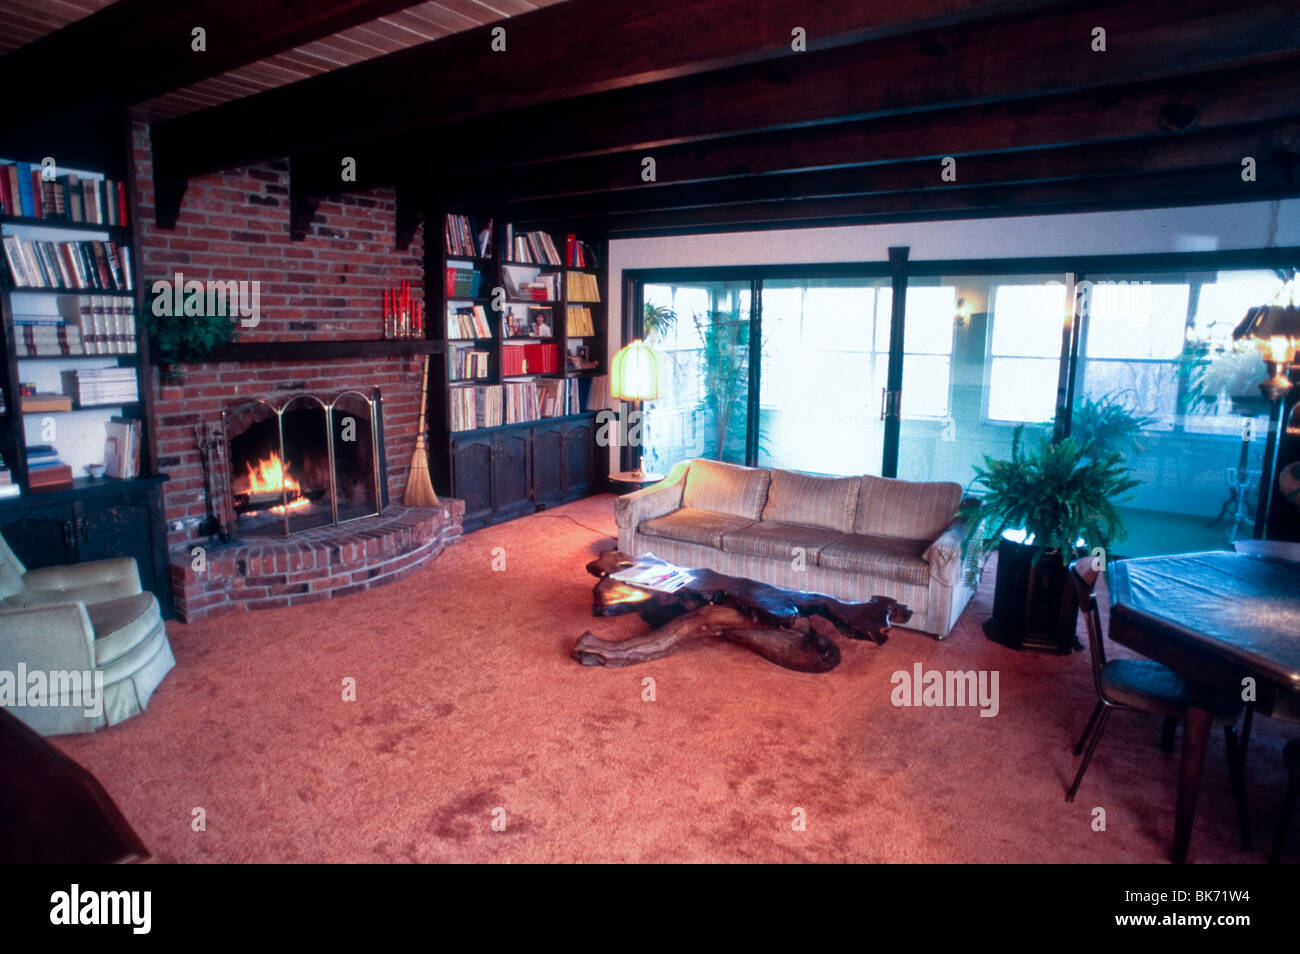 Single Familie Haus, Interieur Wohnzimmer, Kamin, Holz Holzbalken ...